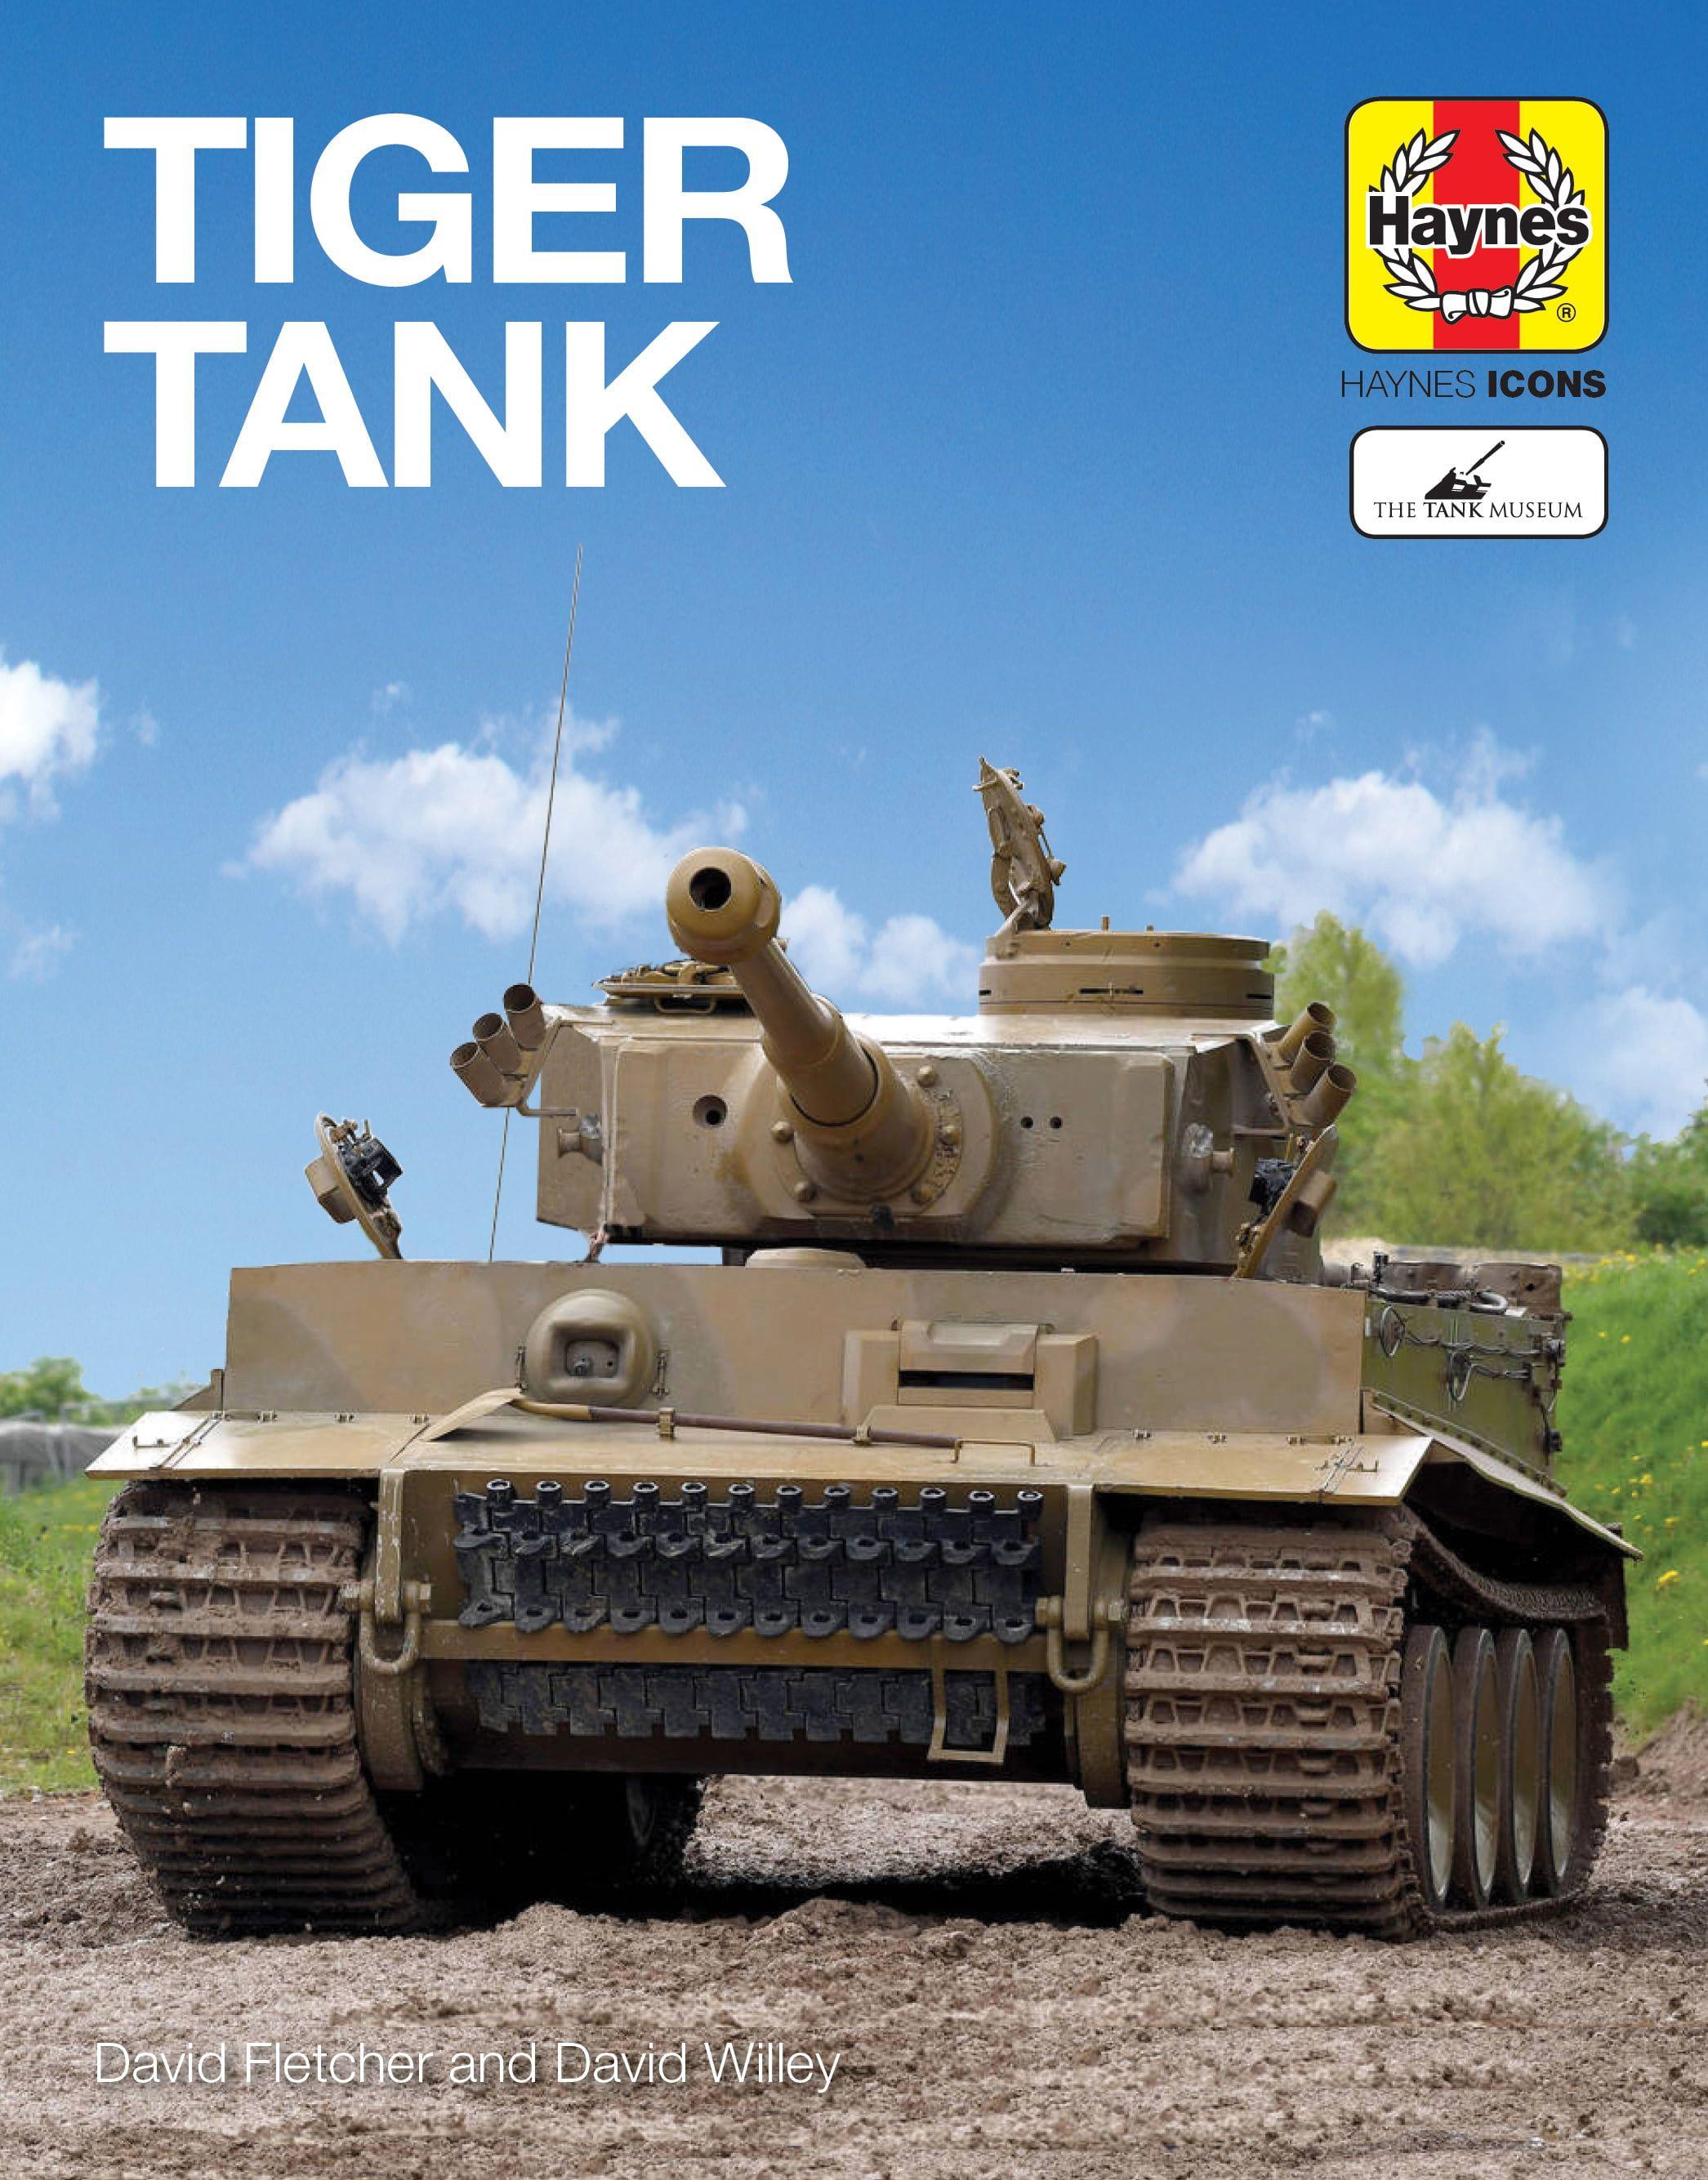 Haynes Icons Tiger Tank Manual